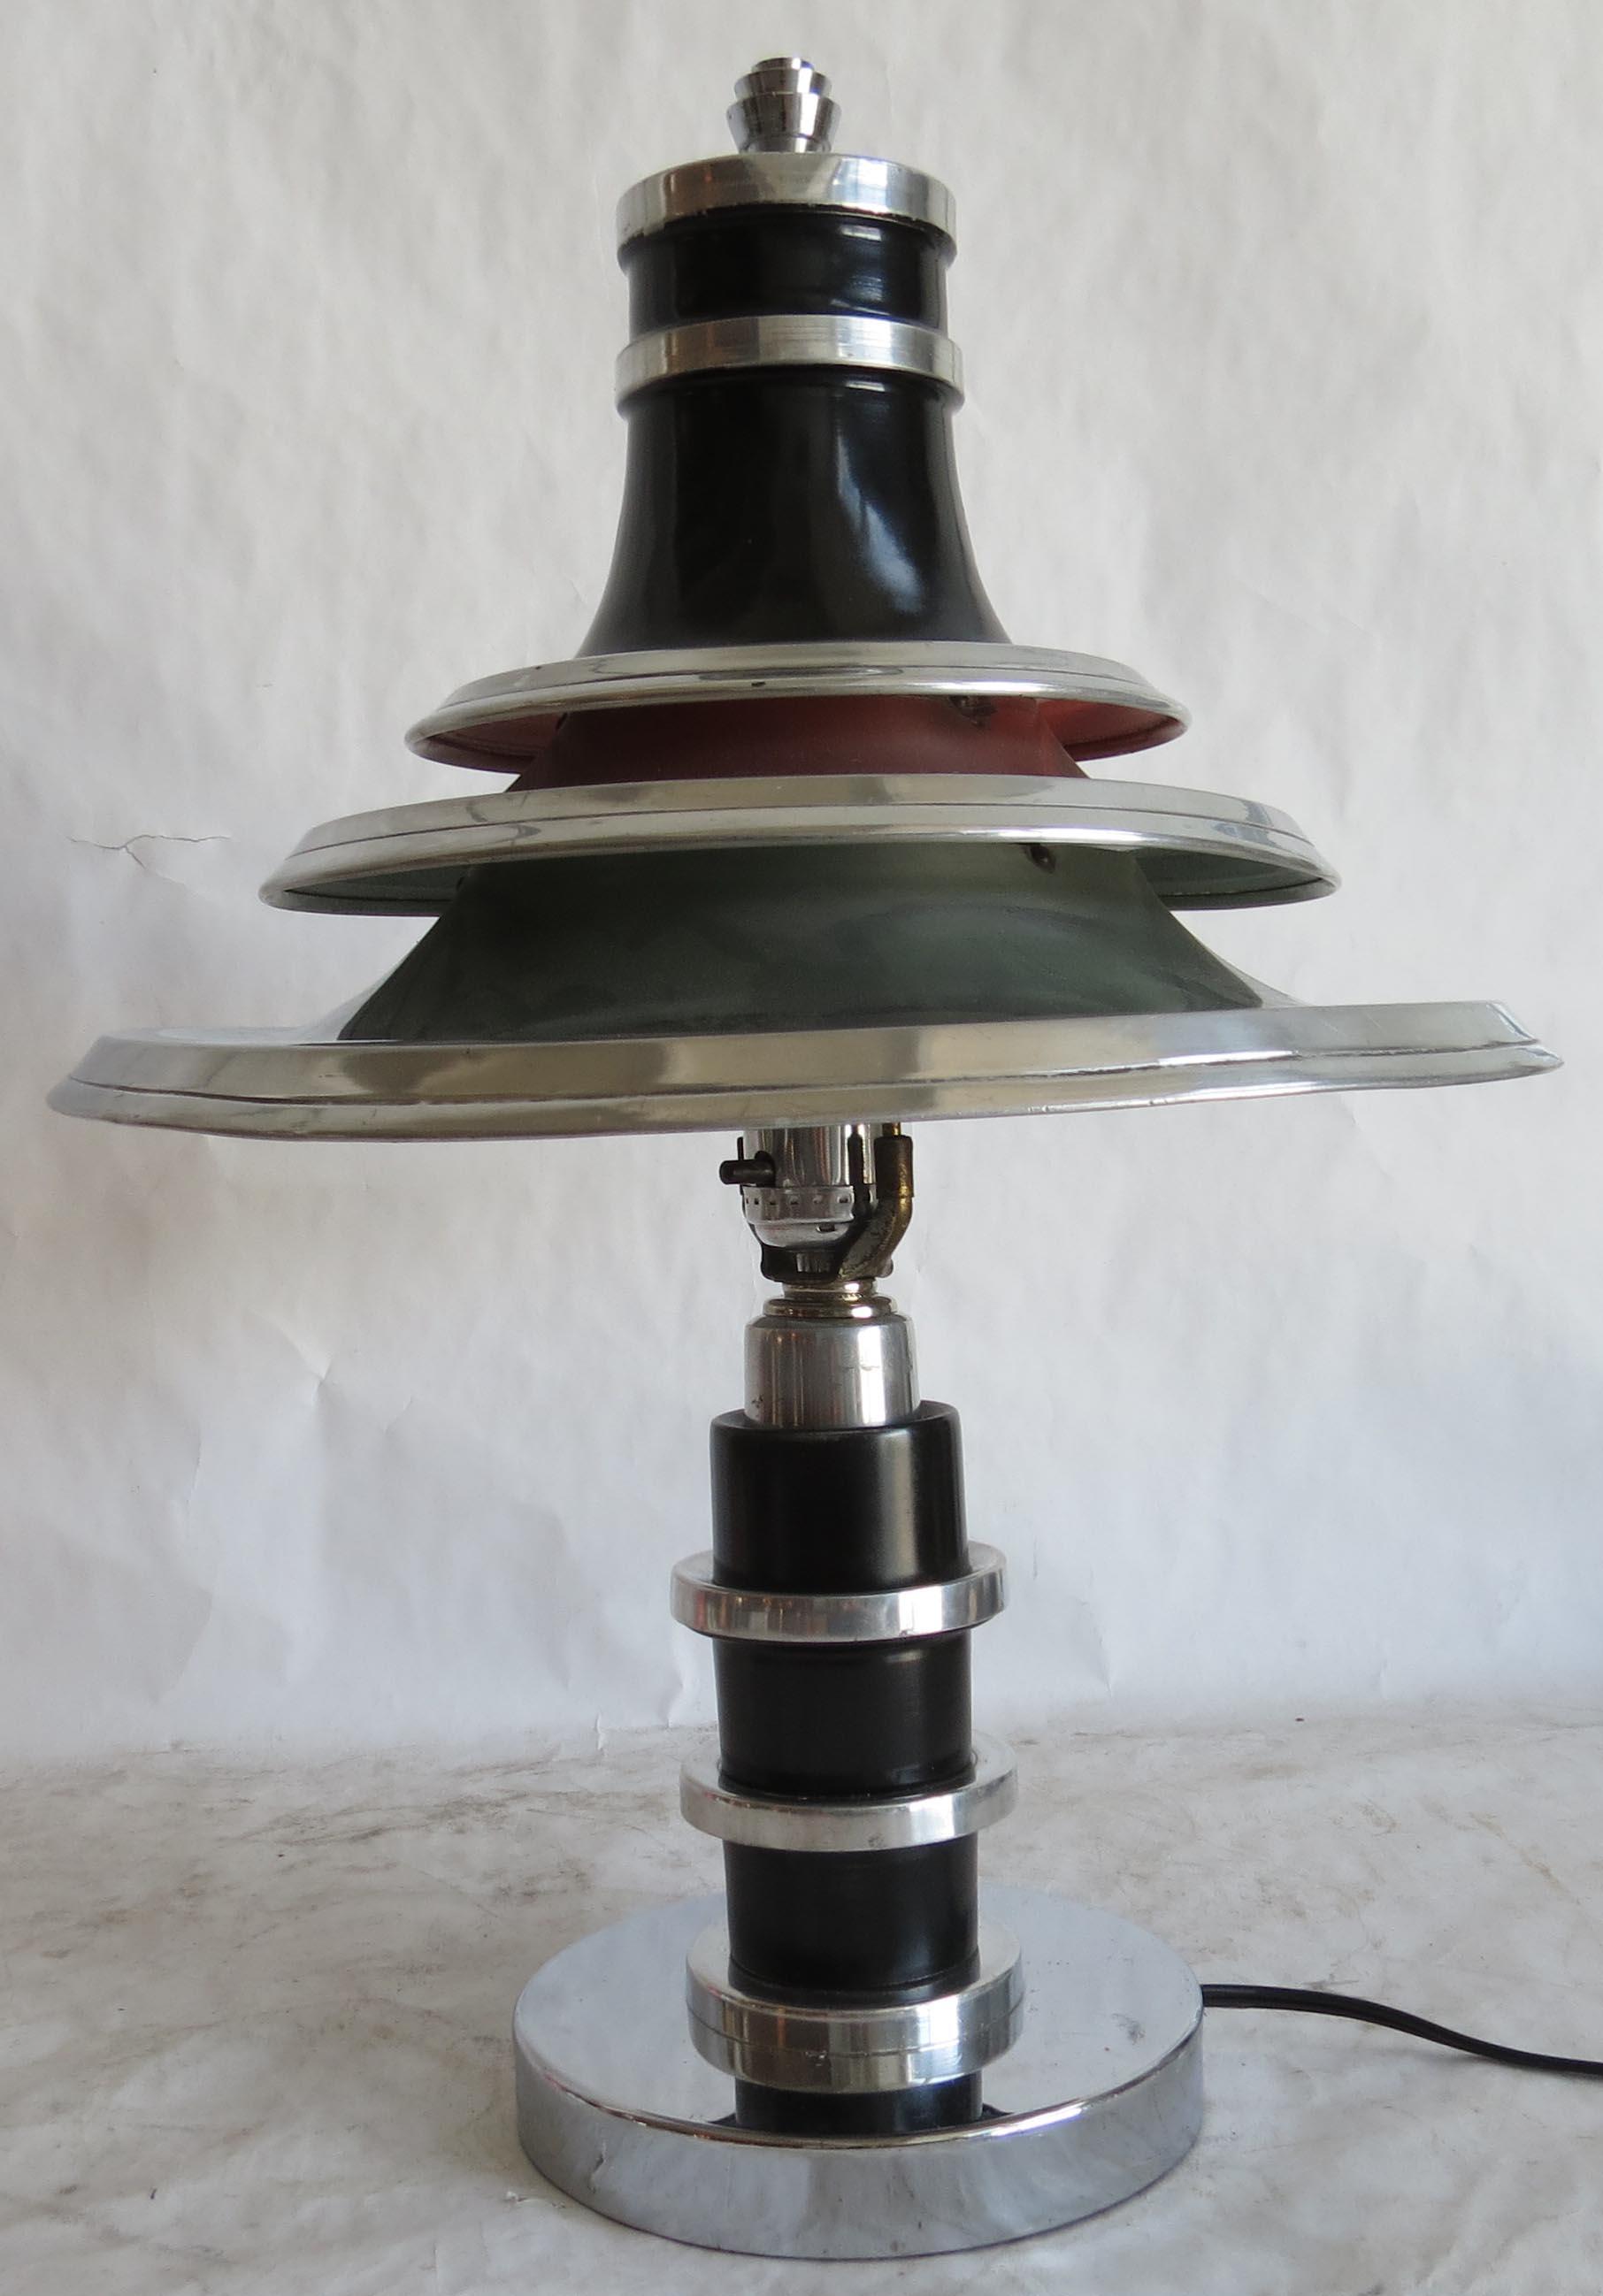 Edward Kent American Art Deco Table Lamp